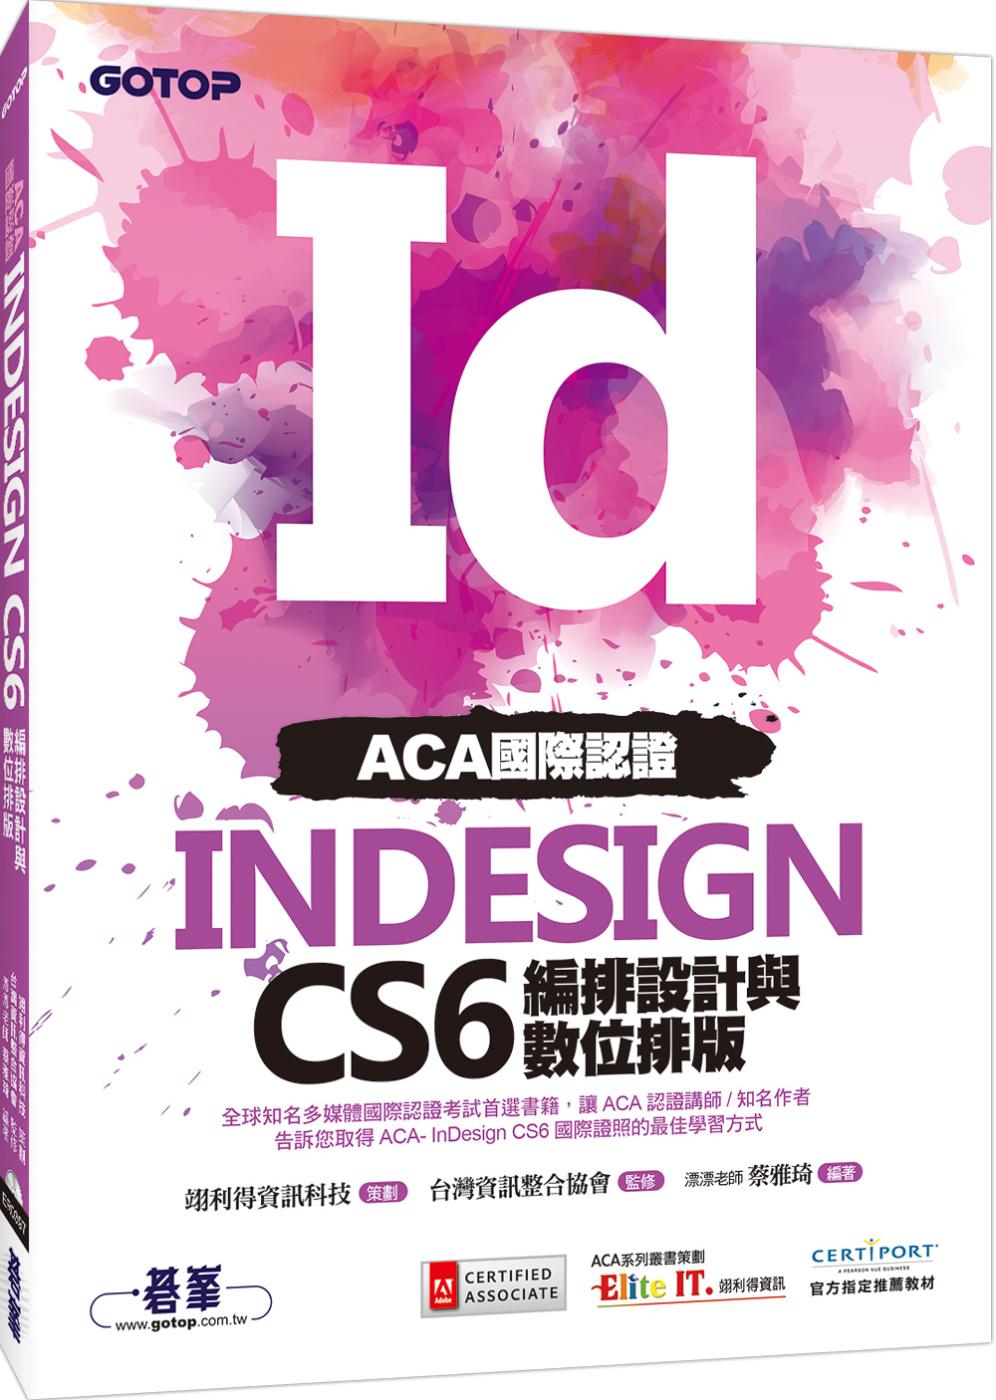 ACA國際認證:InDesign CS6編排設計與數位排版